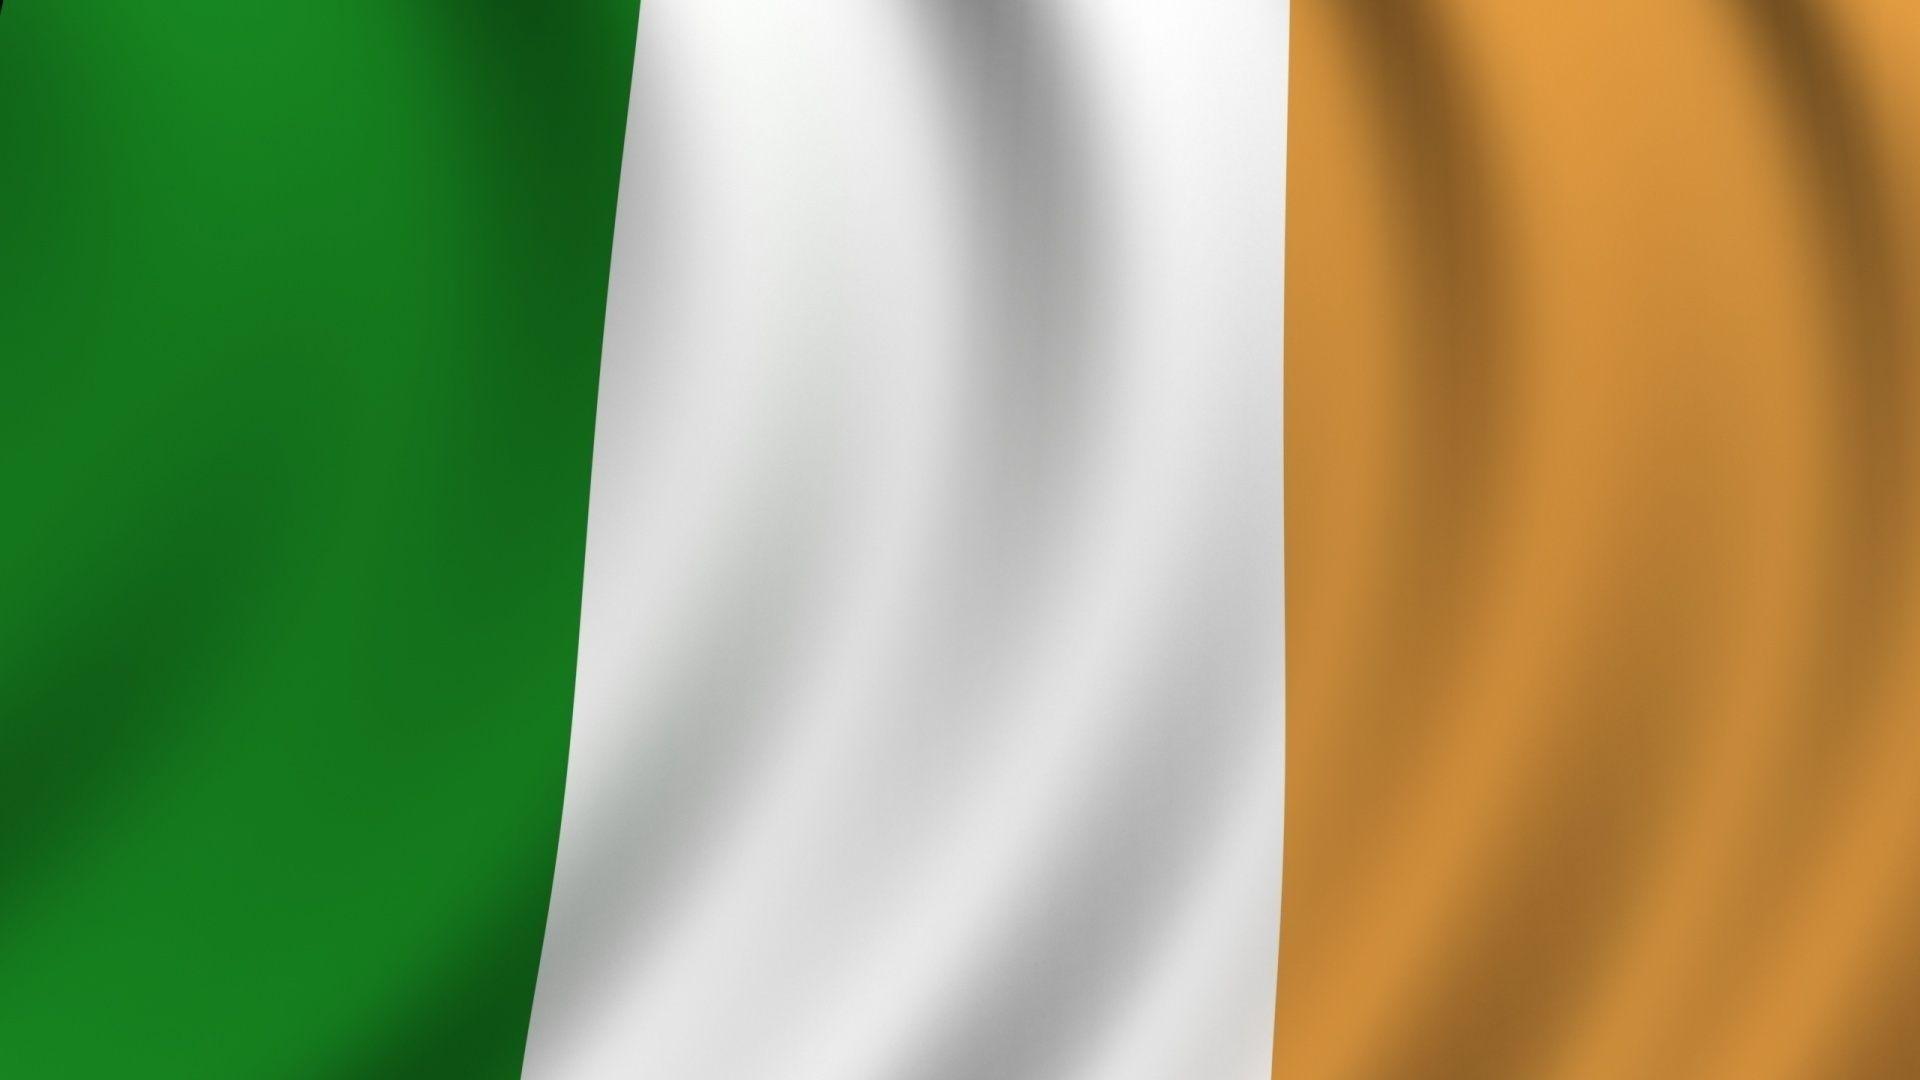 Ireland Flag Wallpapers - Wallpaper Cave